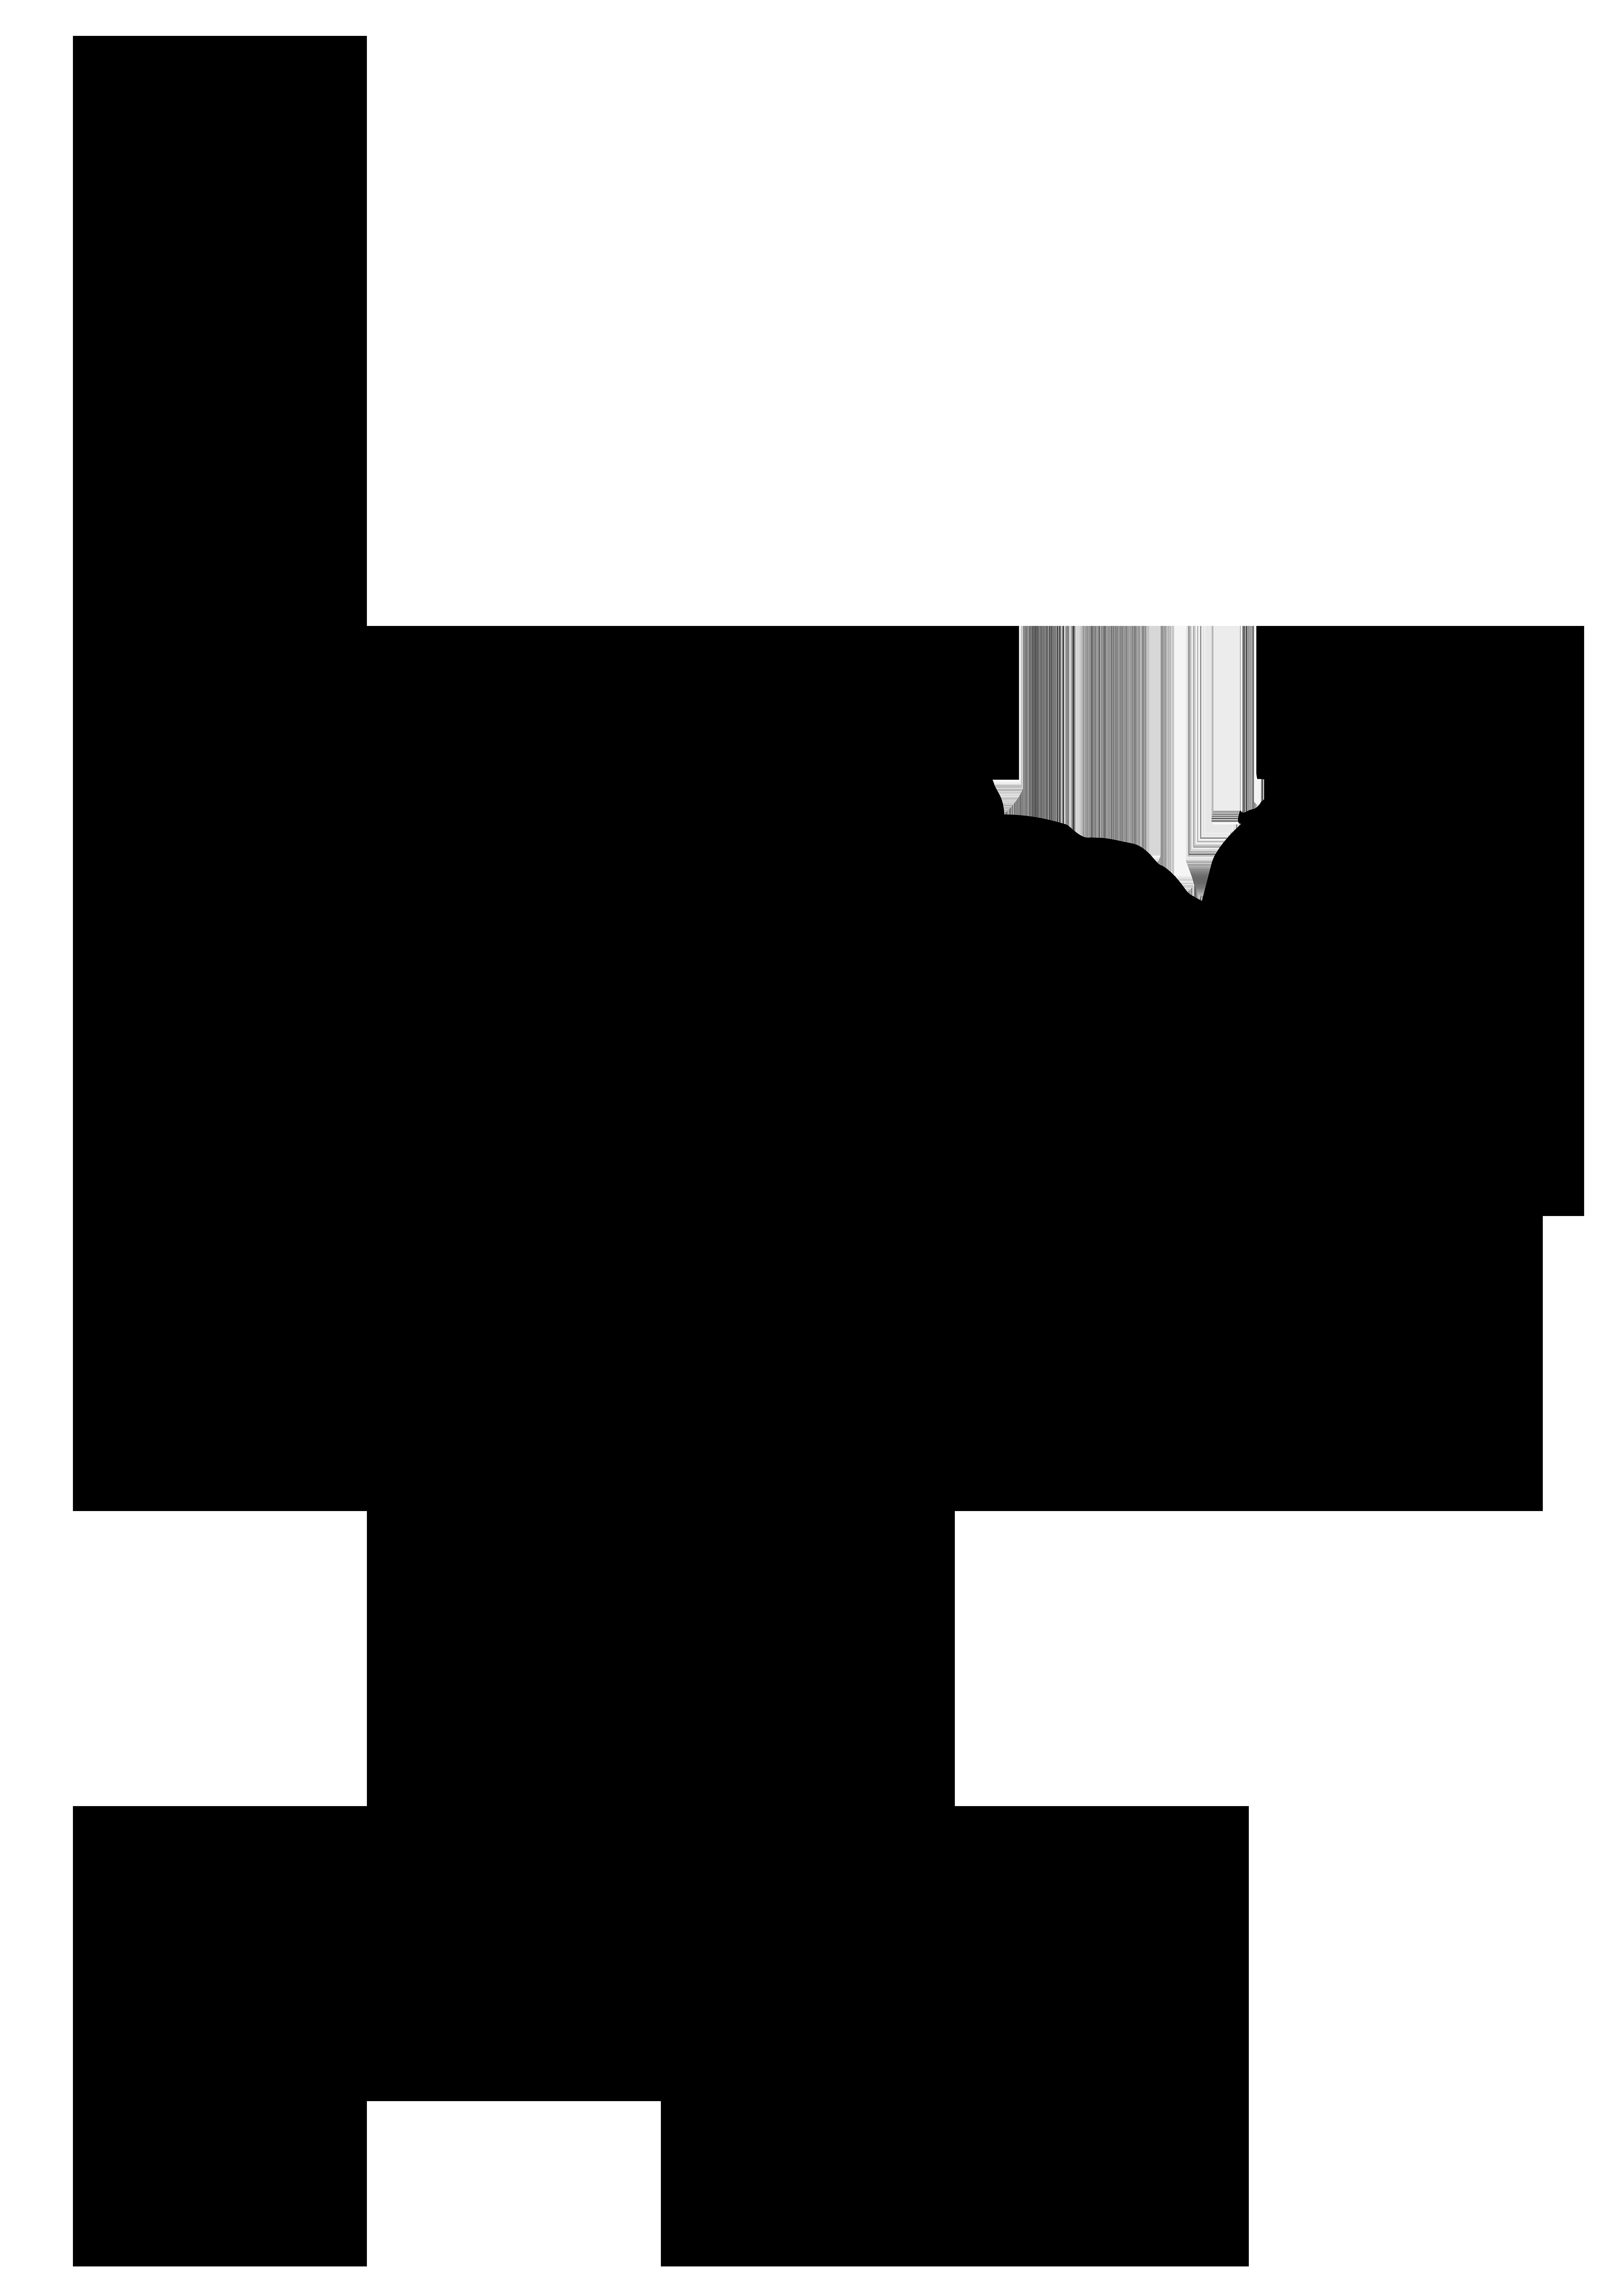 Ostrich silhouette png transparent. Clipart bird body